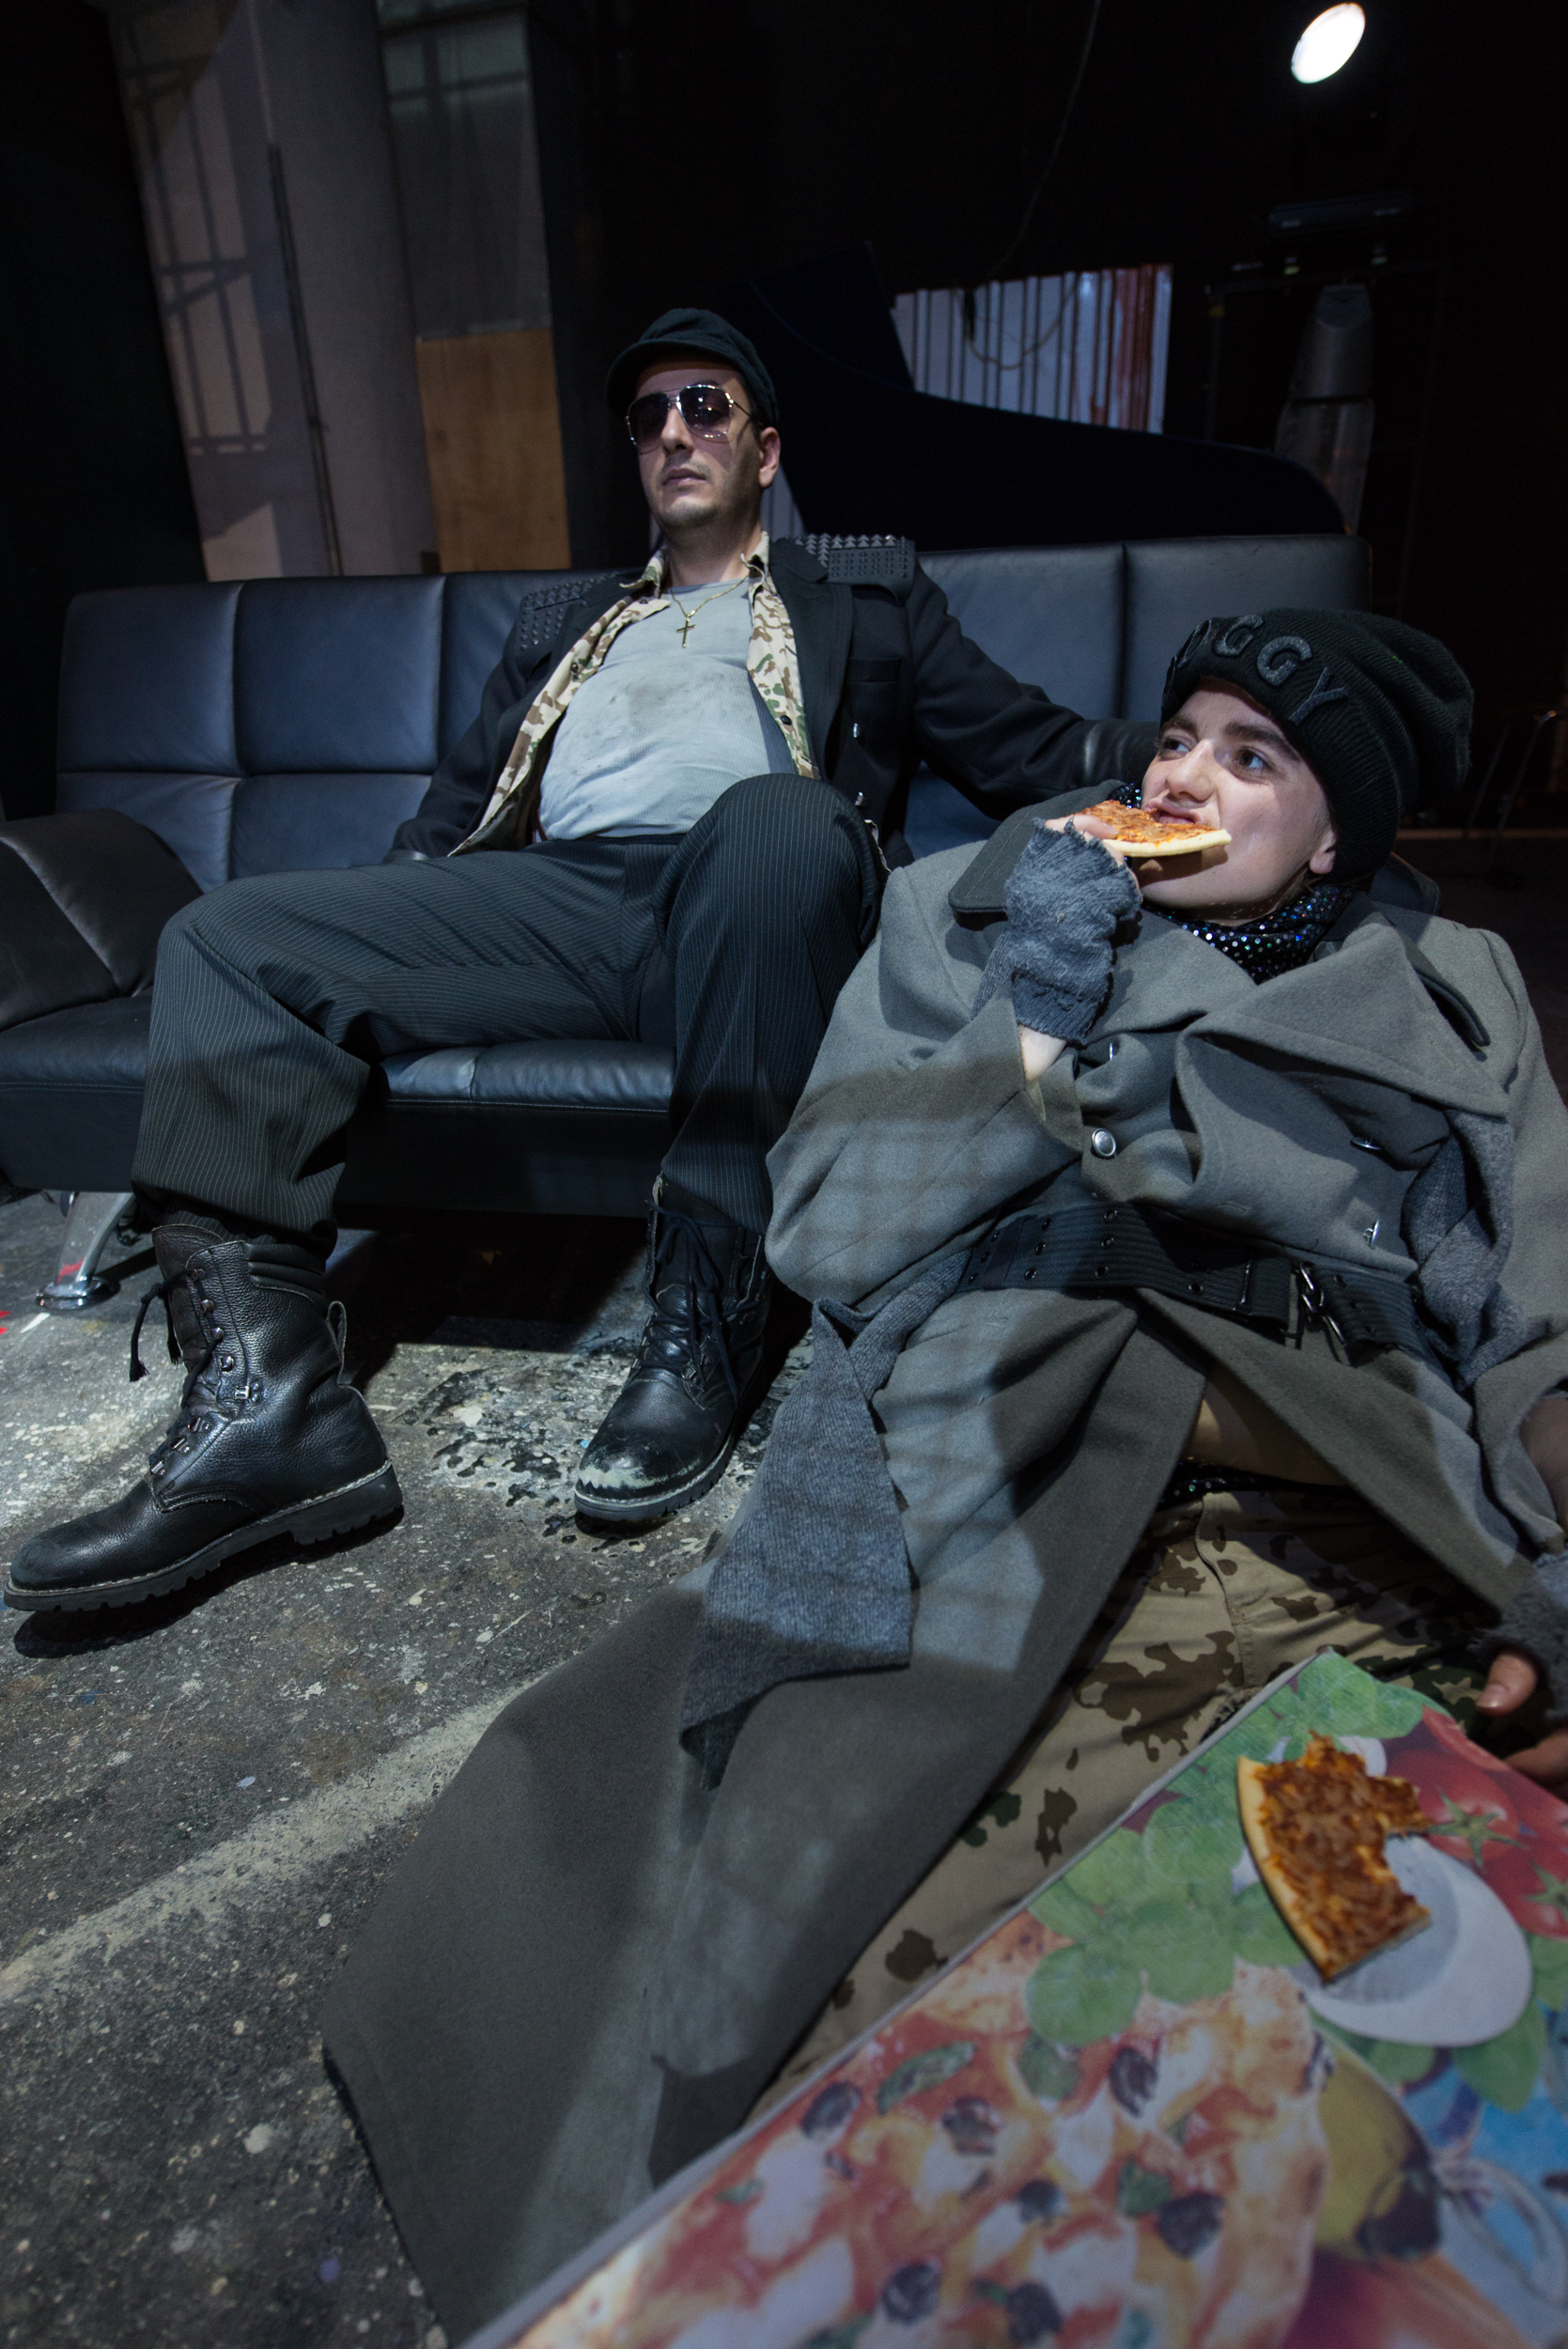 Iro  (Ulisse)   Theaterakademie August Everding, München 2016  mit Irakli Atanelishvili  Foto Jean-Marc Turmes